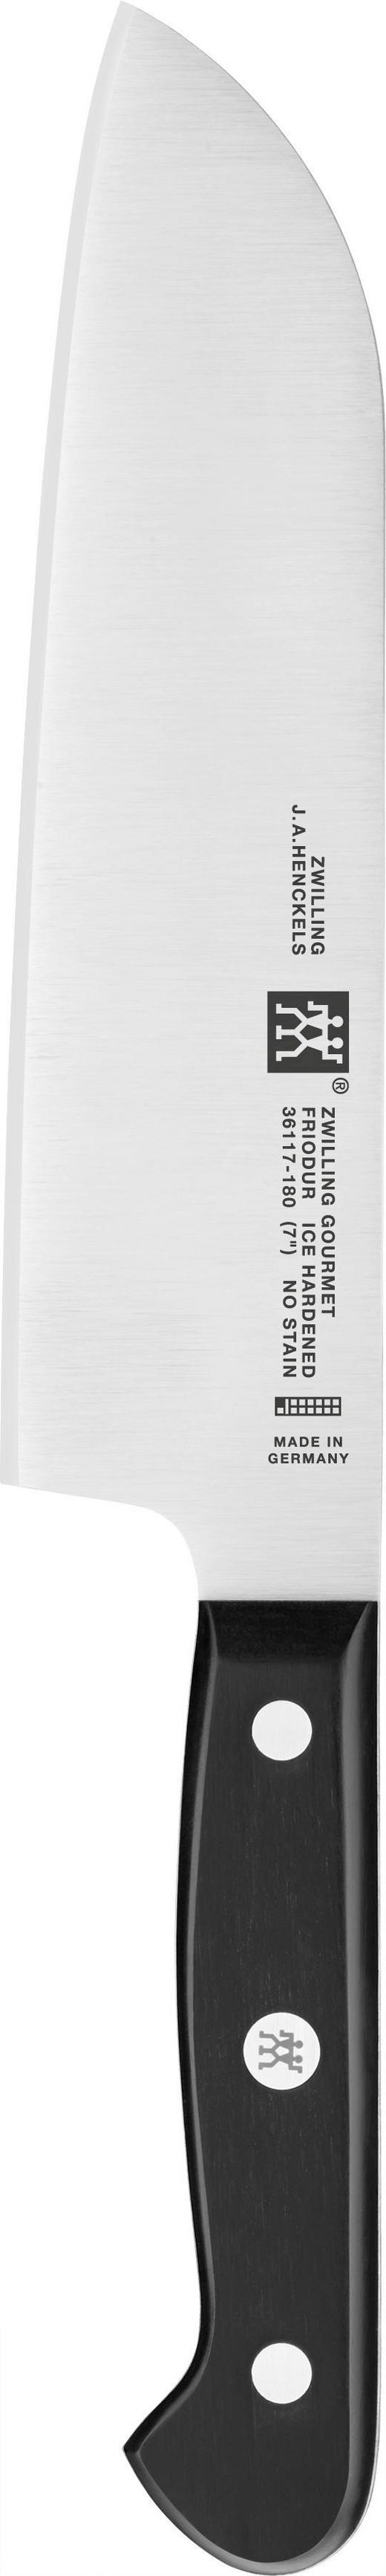 SANTOKUMESSER - Silberfarben/Schwarz, Basics, Kunststoff/Metall - Zwilling